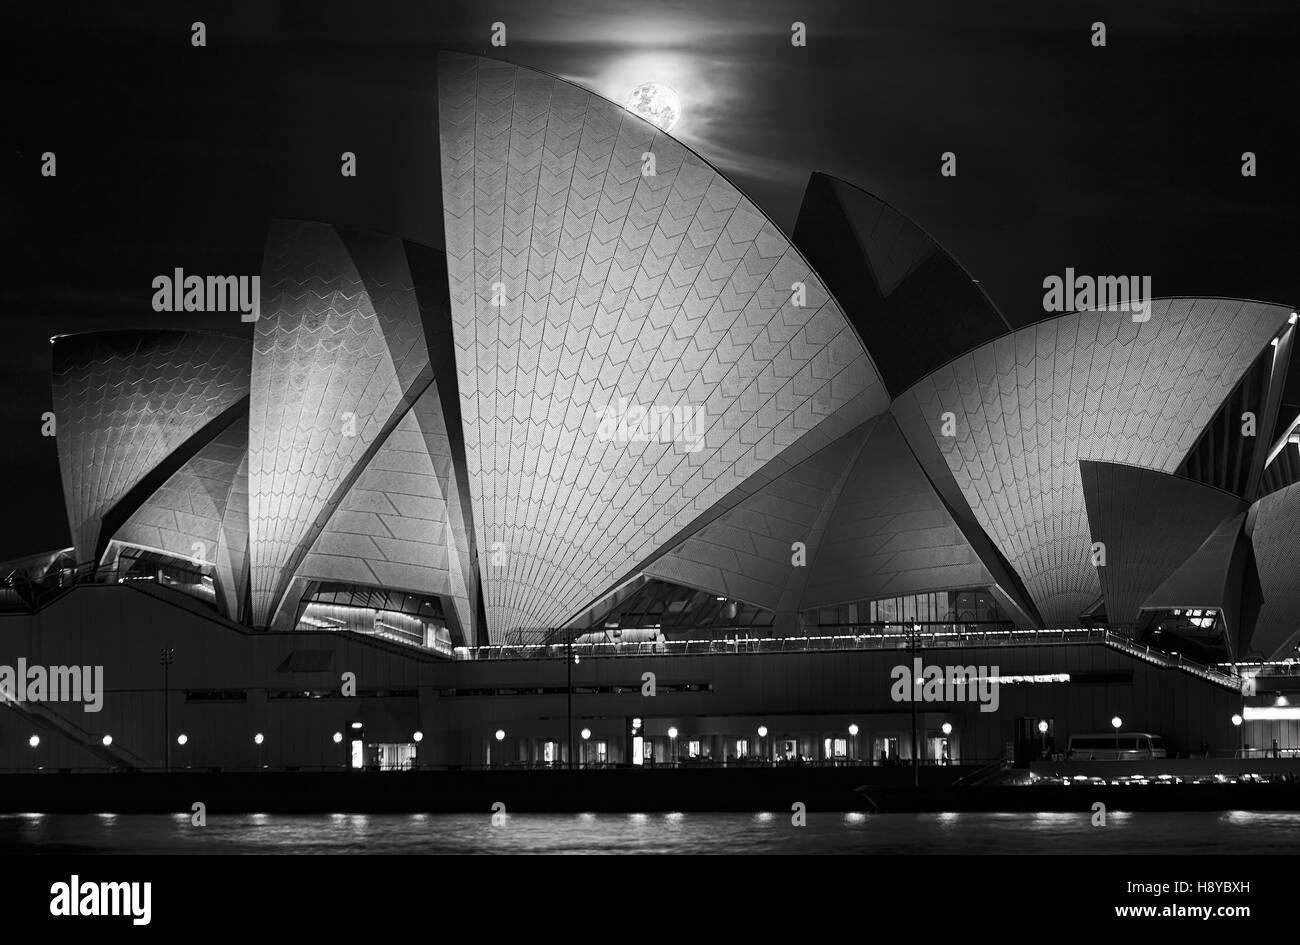 Sydney, Australia - 15 November 2016: Super full moon rising over Sydney Opera House in Australia during unique - Stock Image